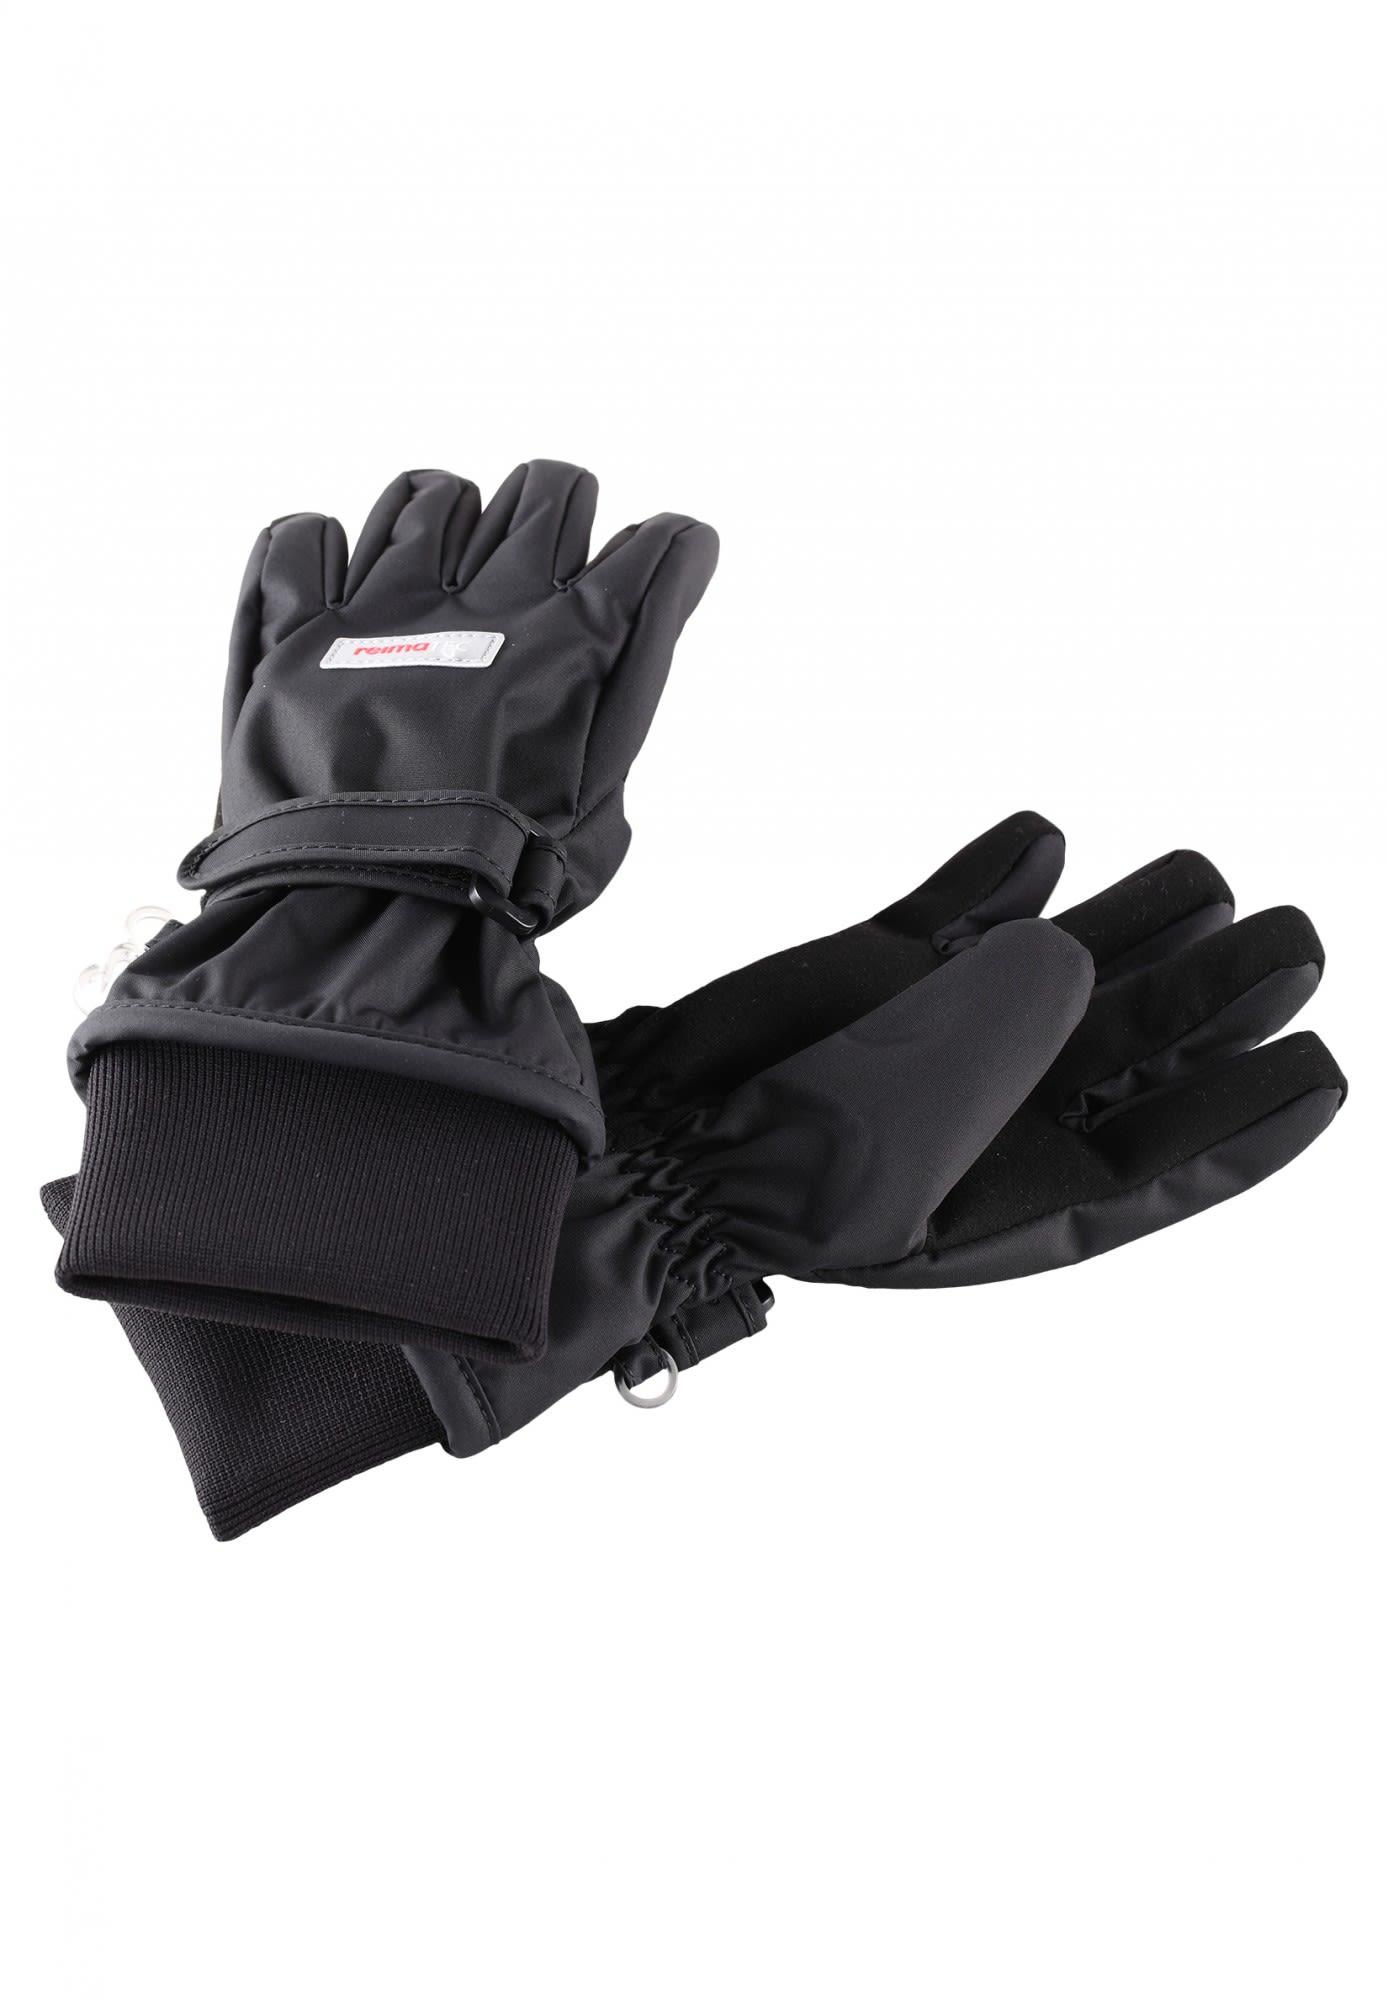 Reima Kids Tartu Gloves | Größe 8,4,5,6,7 | Kinder Fingerhandschuh